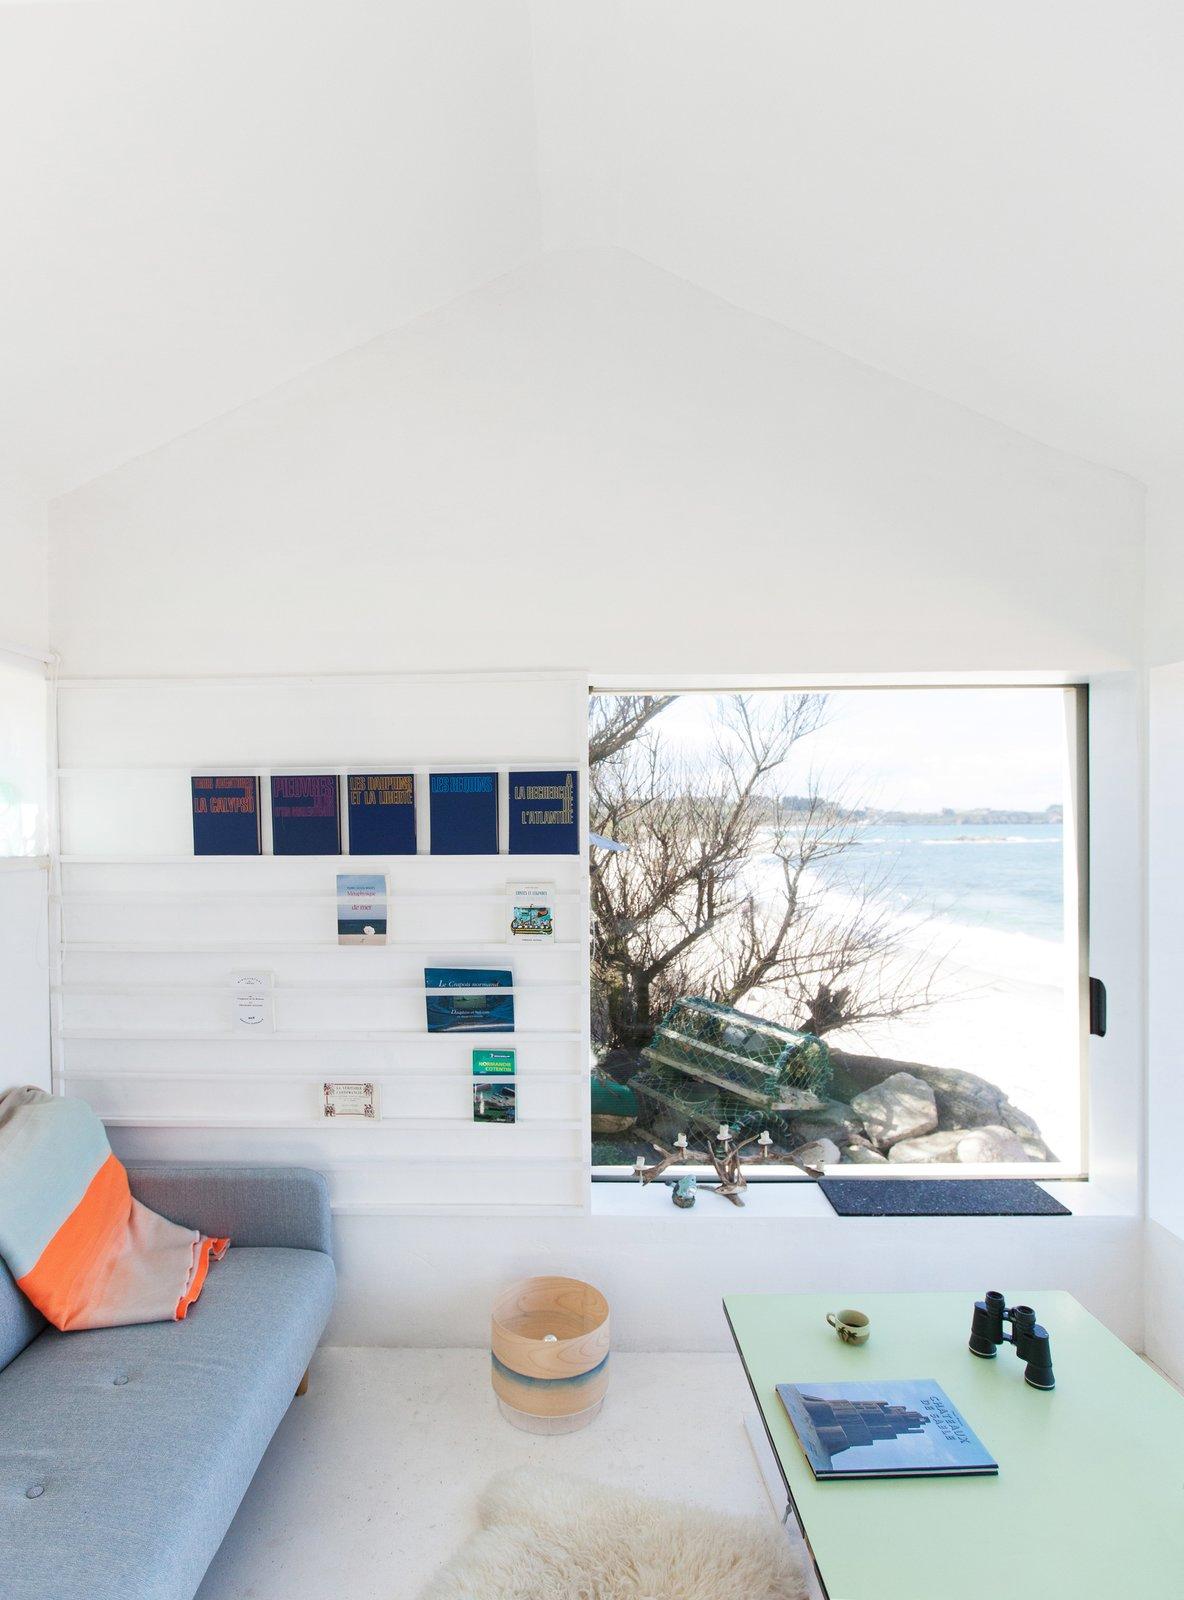 Living Room, Sofa, Bookcase, and Concrete Floor @aubry.guillaume  Viking Seaside Summer Cabin